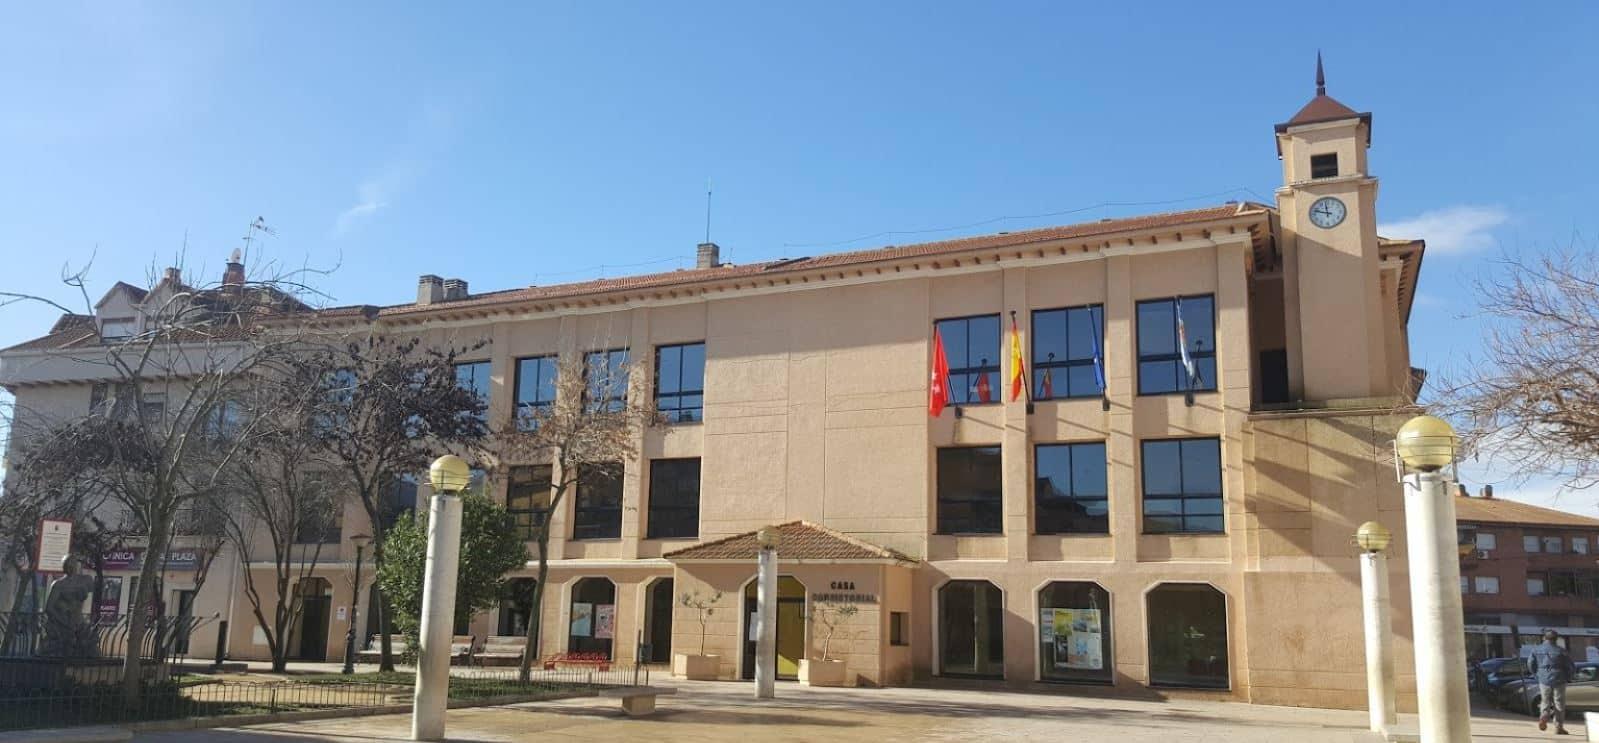 Registro civil - Ayuntamiento Velilla de San Antonio